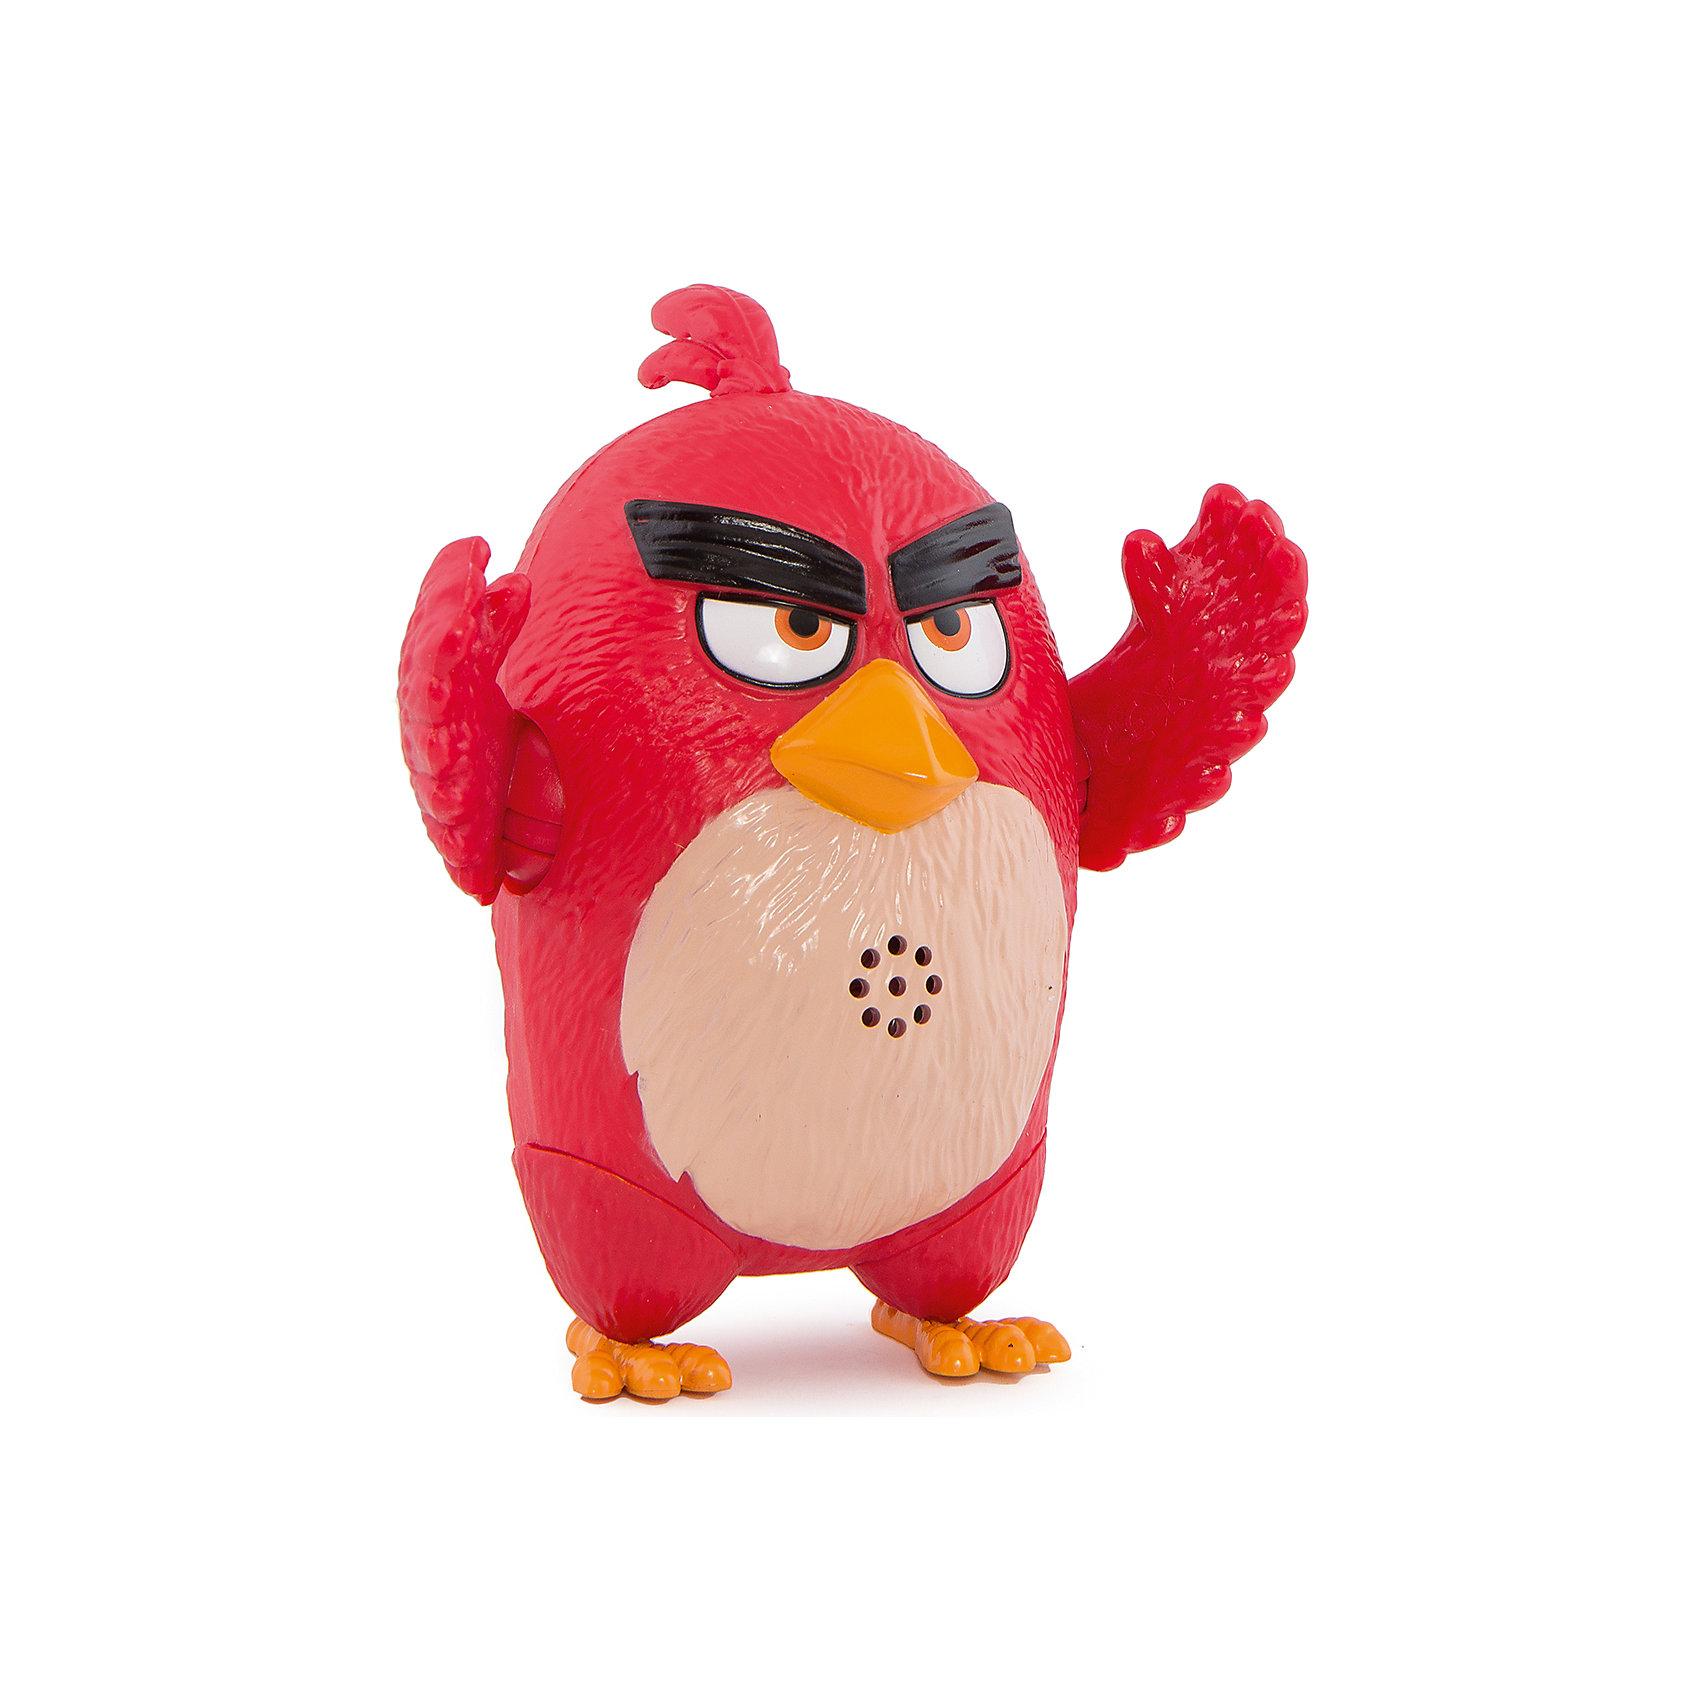 Spin Master Интерактивная говорящая птица Ред, Angry Birds spin master коллекционная фигурка сердитая птичка angry birds 90501 40073074